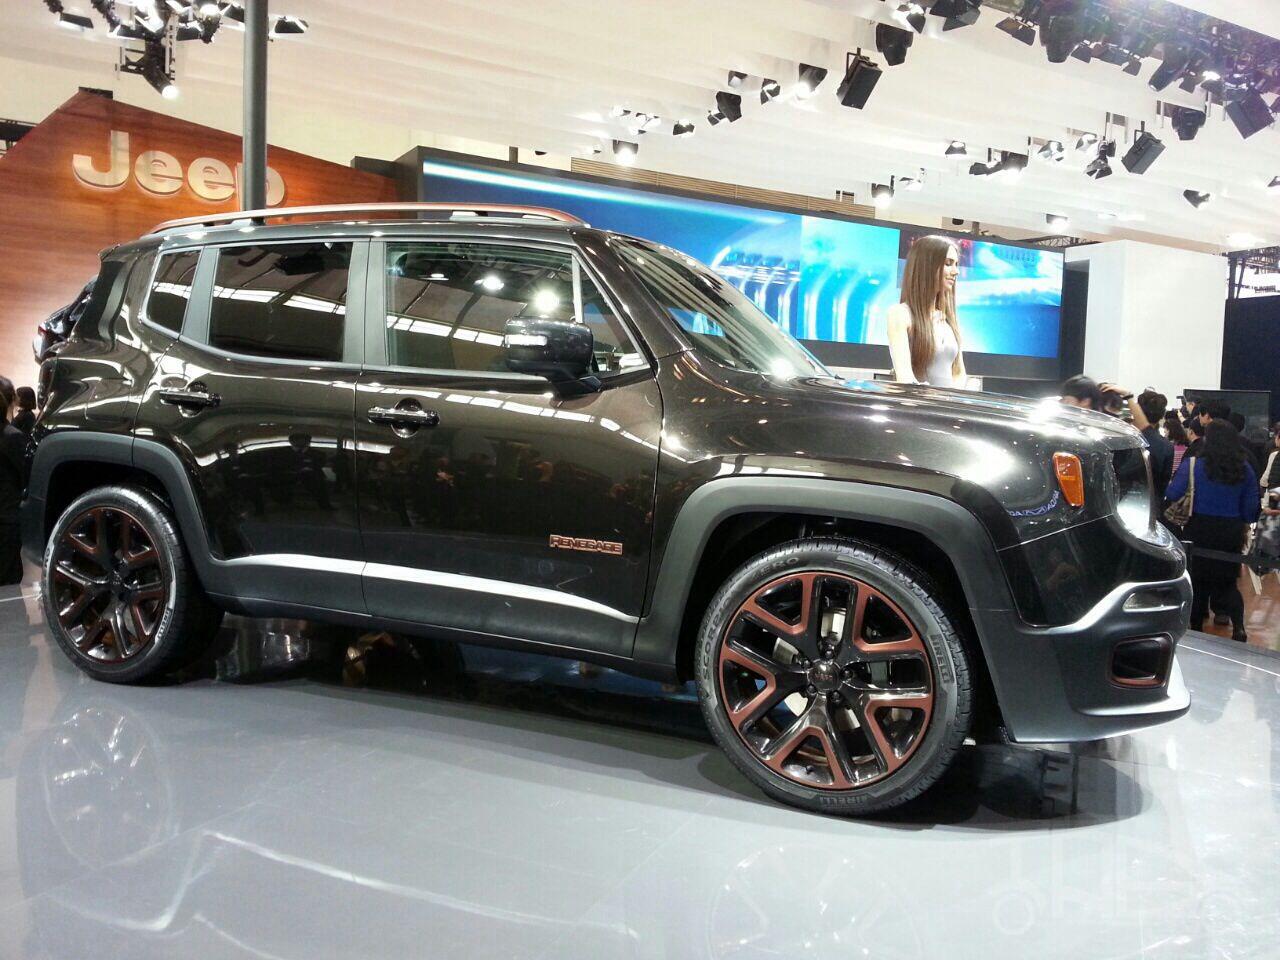 New Jeep Renegade Custom Cars And Bike Pinterest Jeep